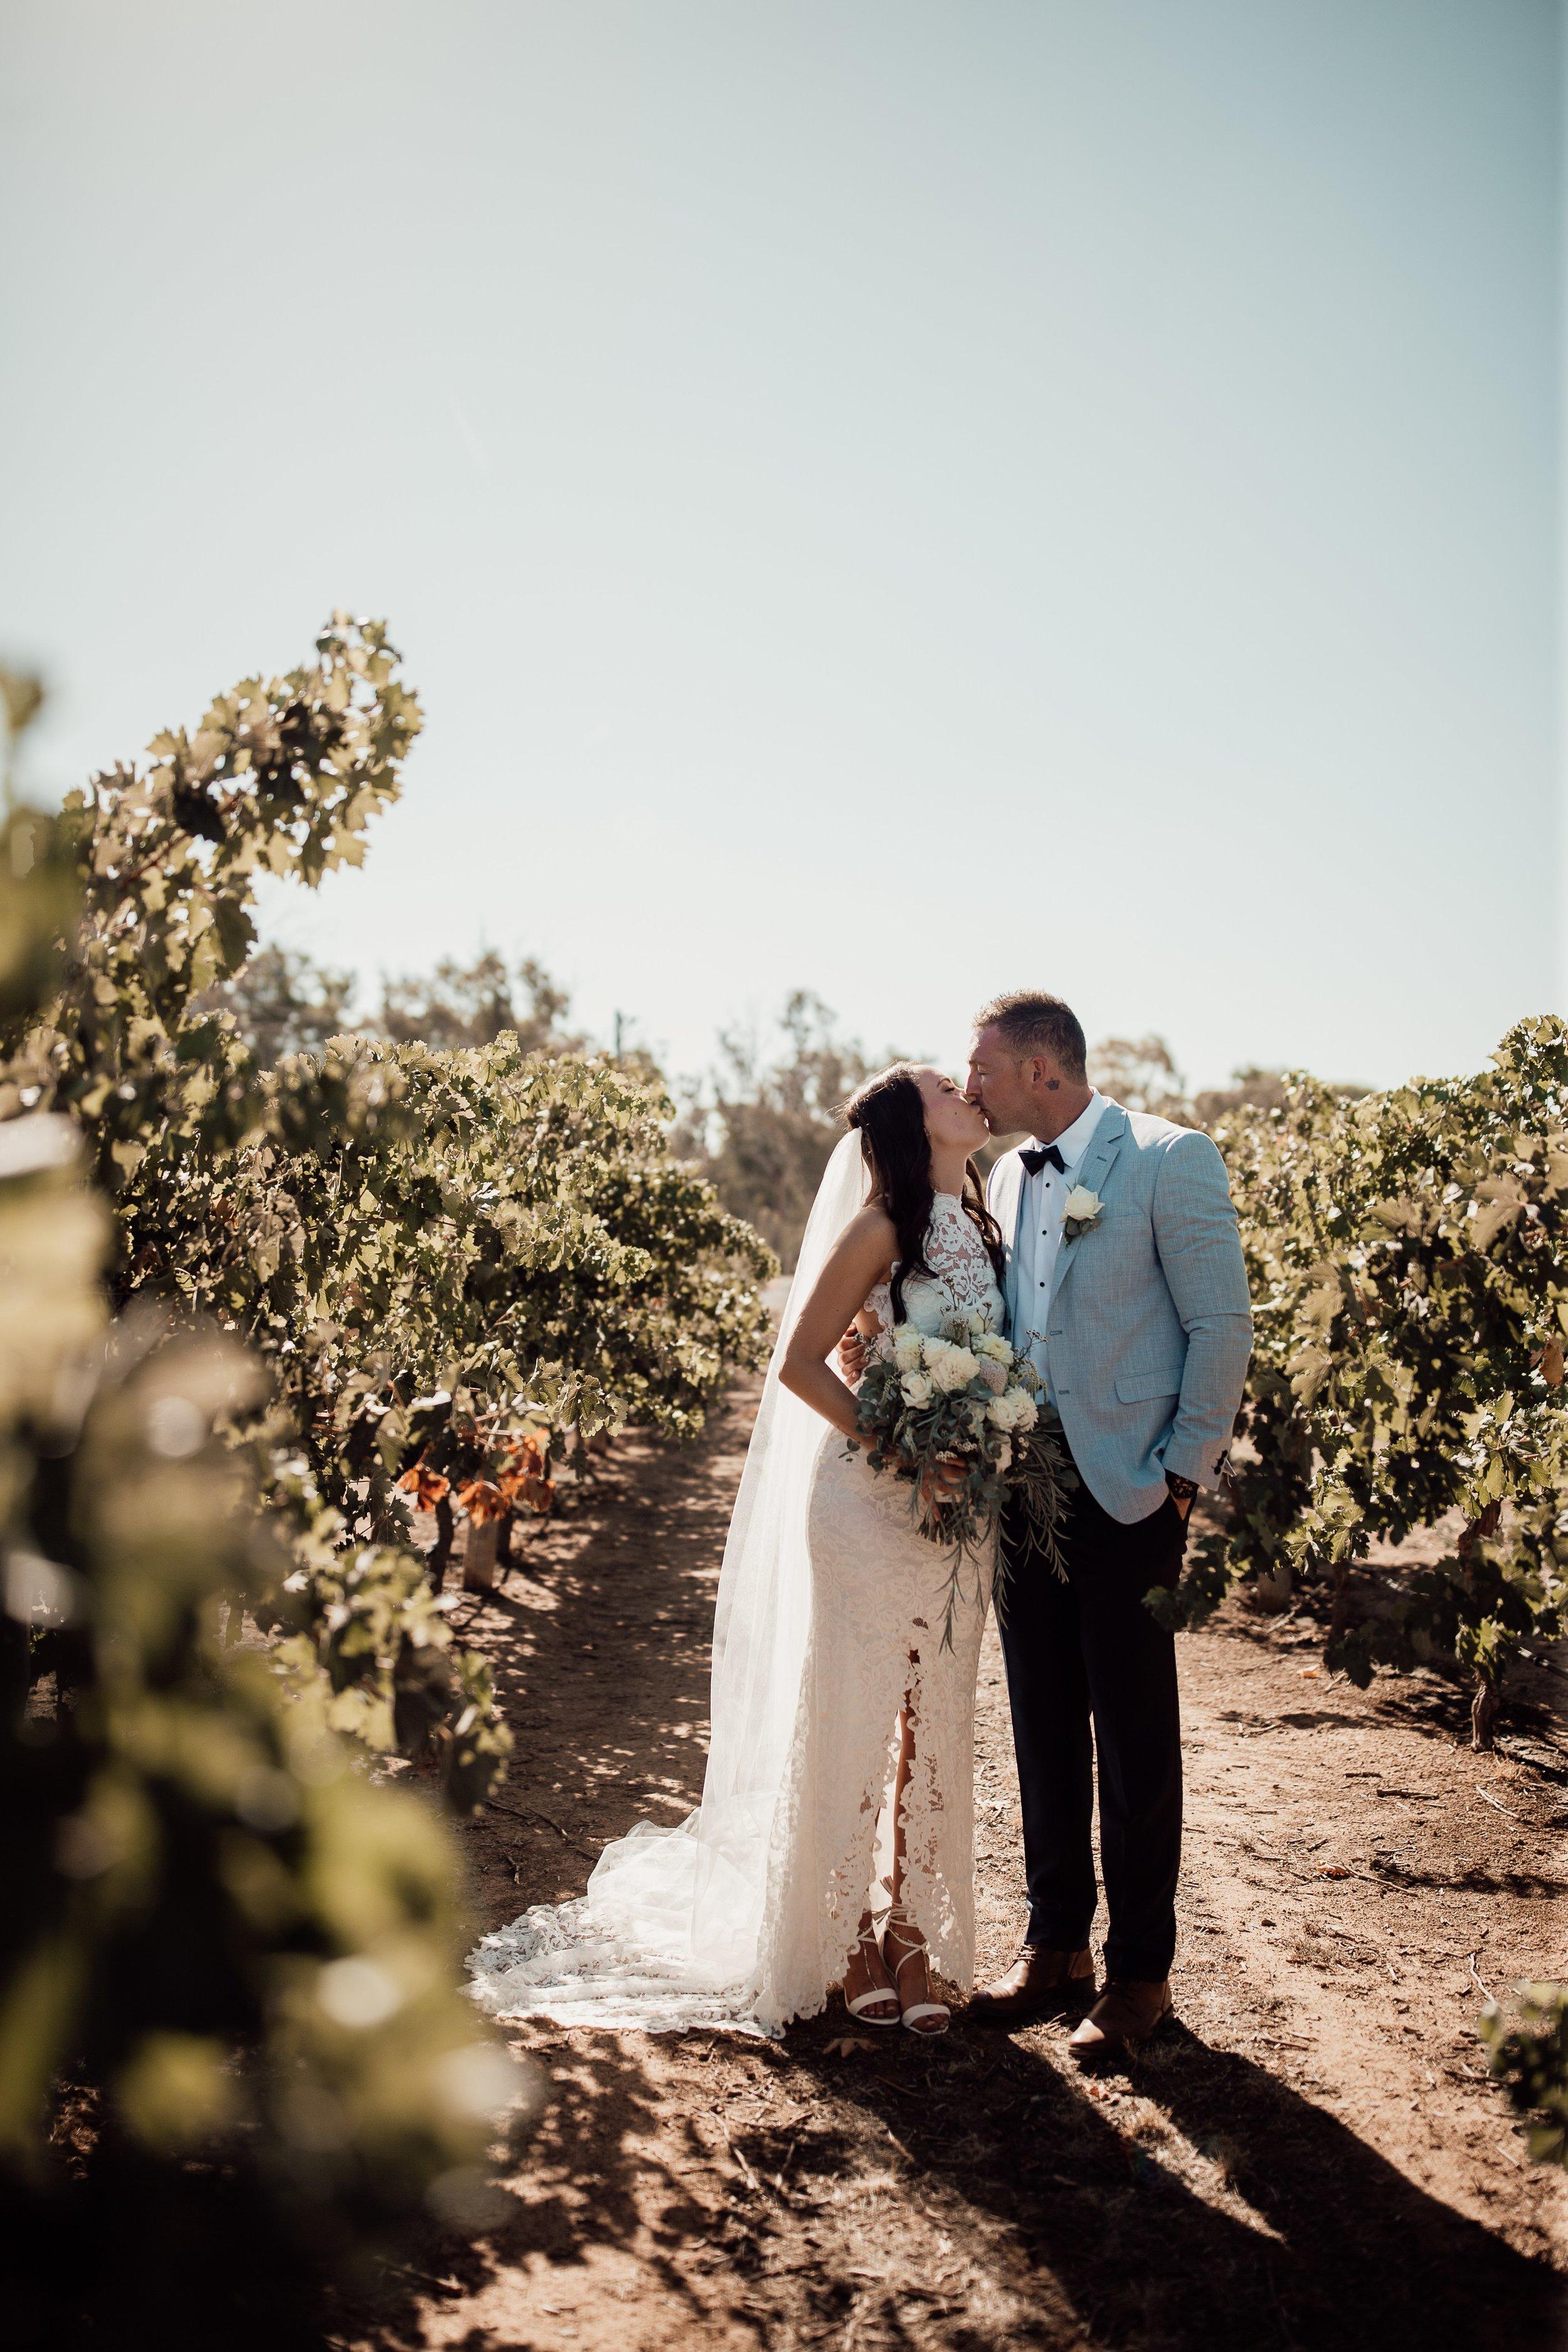 mickalathomas_puremacphotography_weddingphotographer_couplephotographer_Sheppartonphotographer_2900.jpg